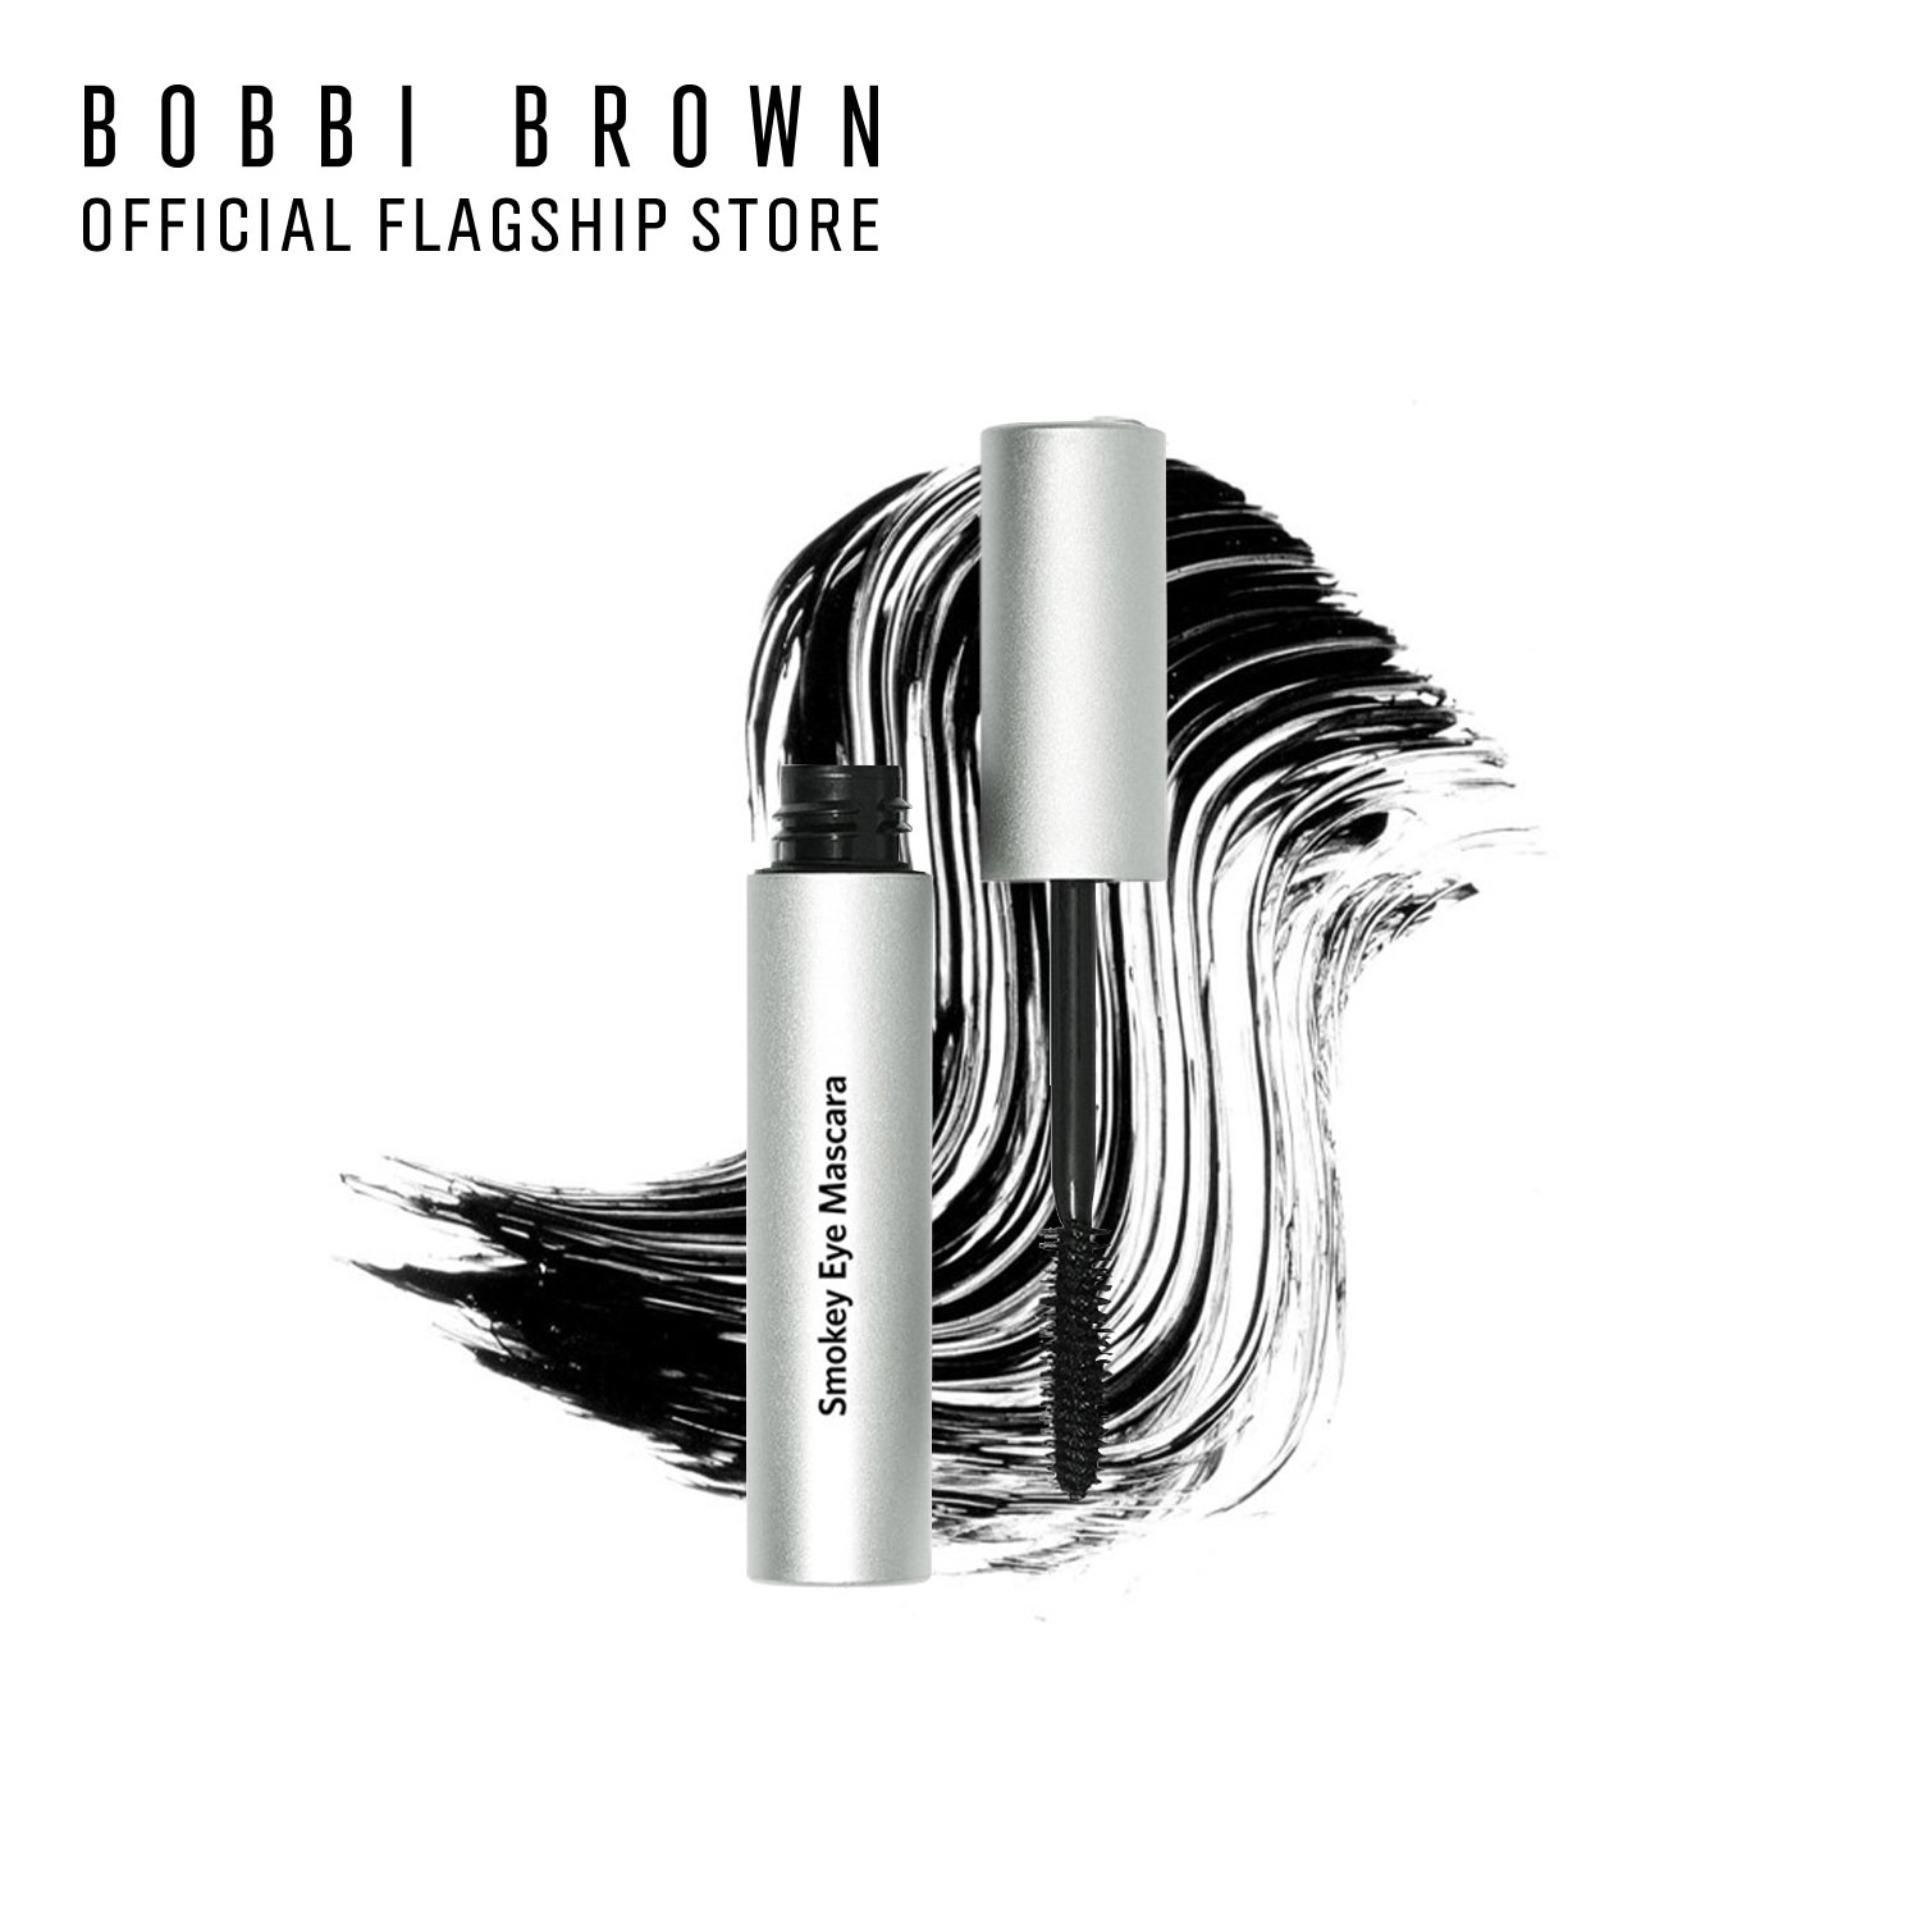 Mascara làm cong và dày mi Bobbi Brown Smokey Eye Mascara 6ml